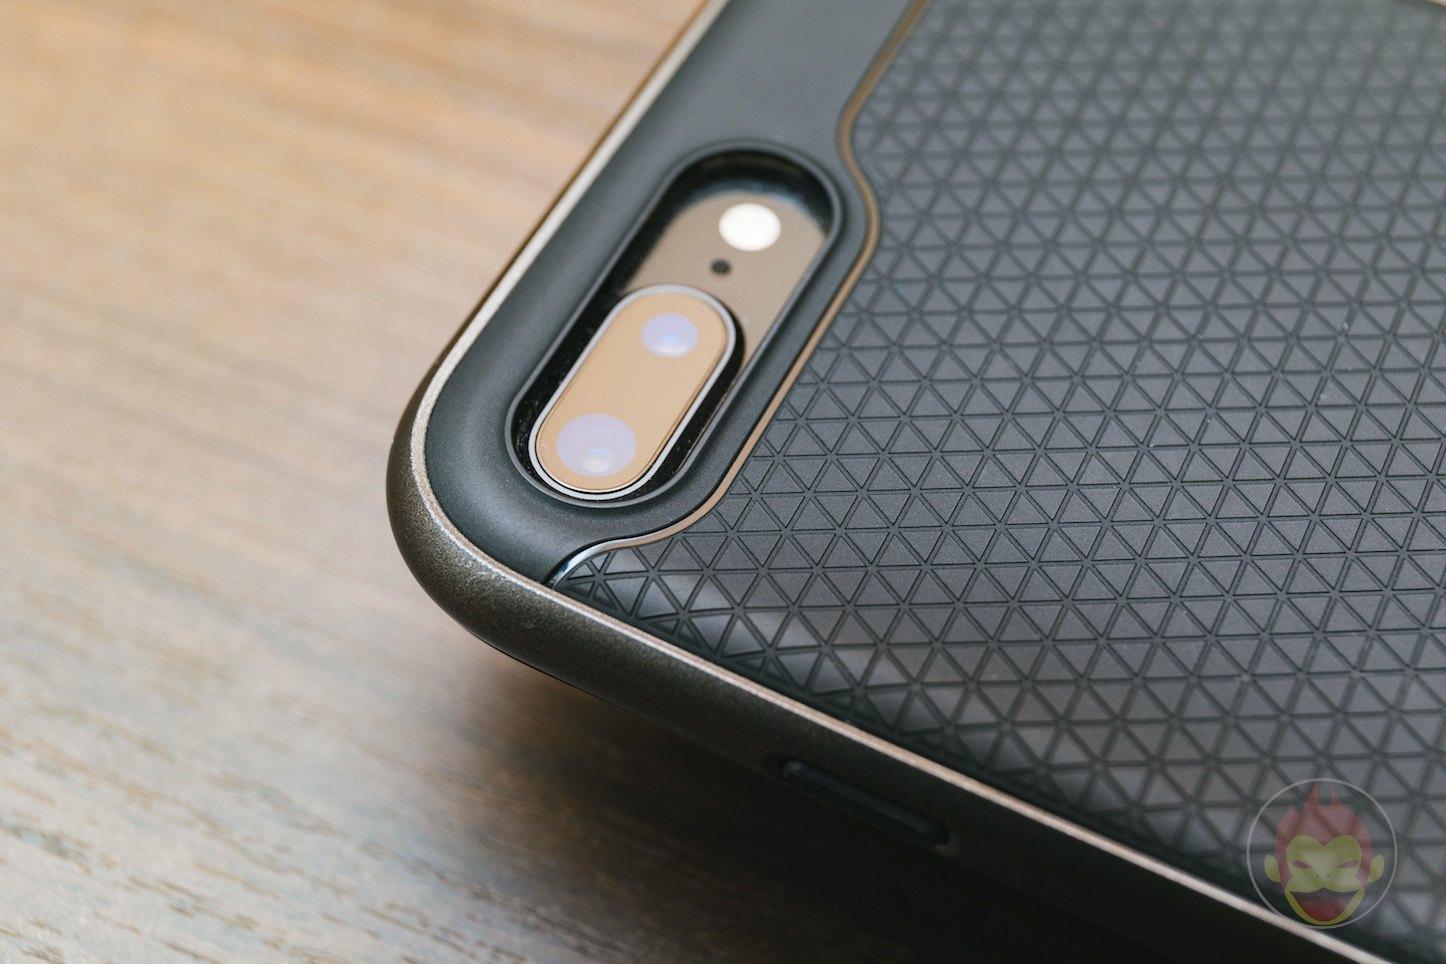 Spigen-Neo-Hybird-2-iPHone8Plus-Case-Review-03.jpg